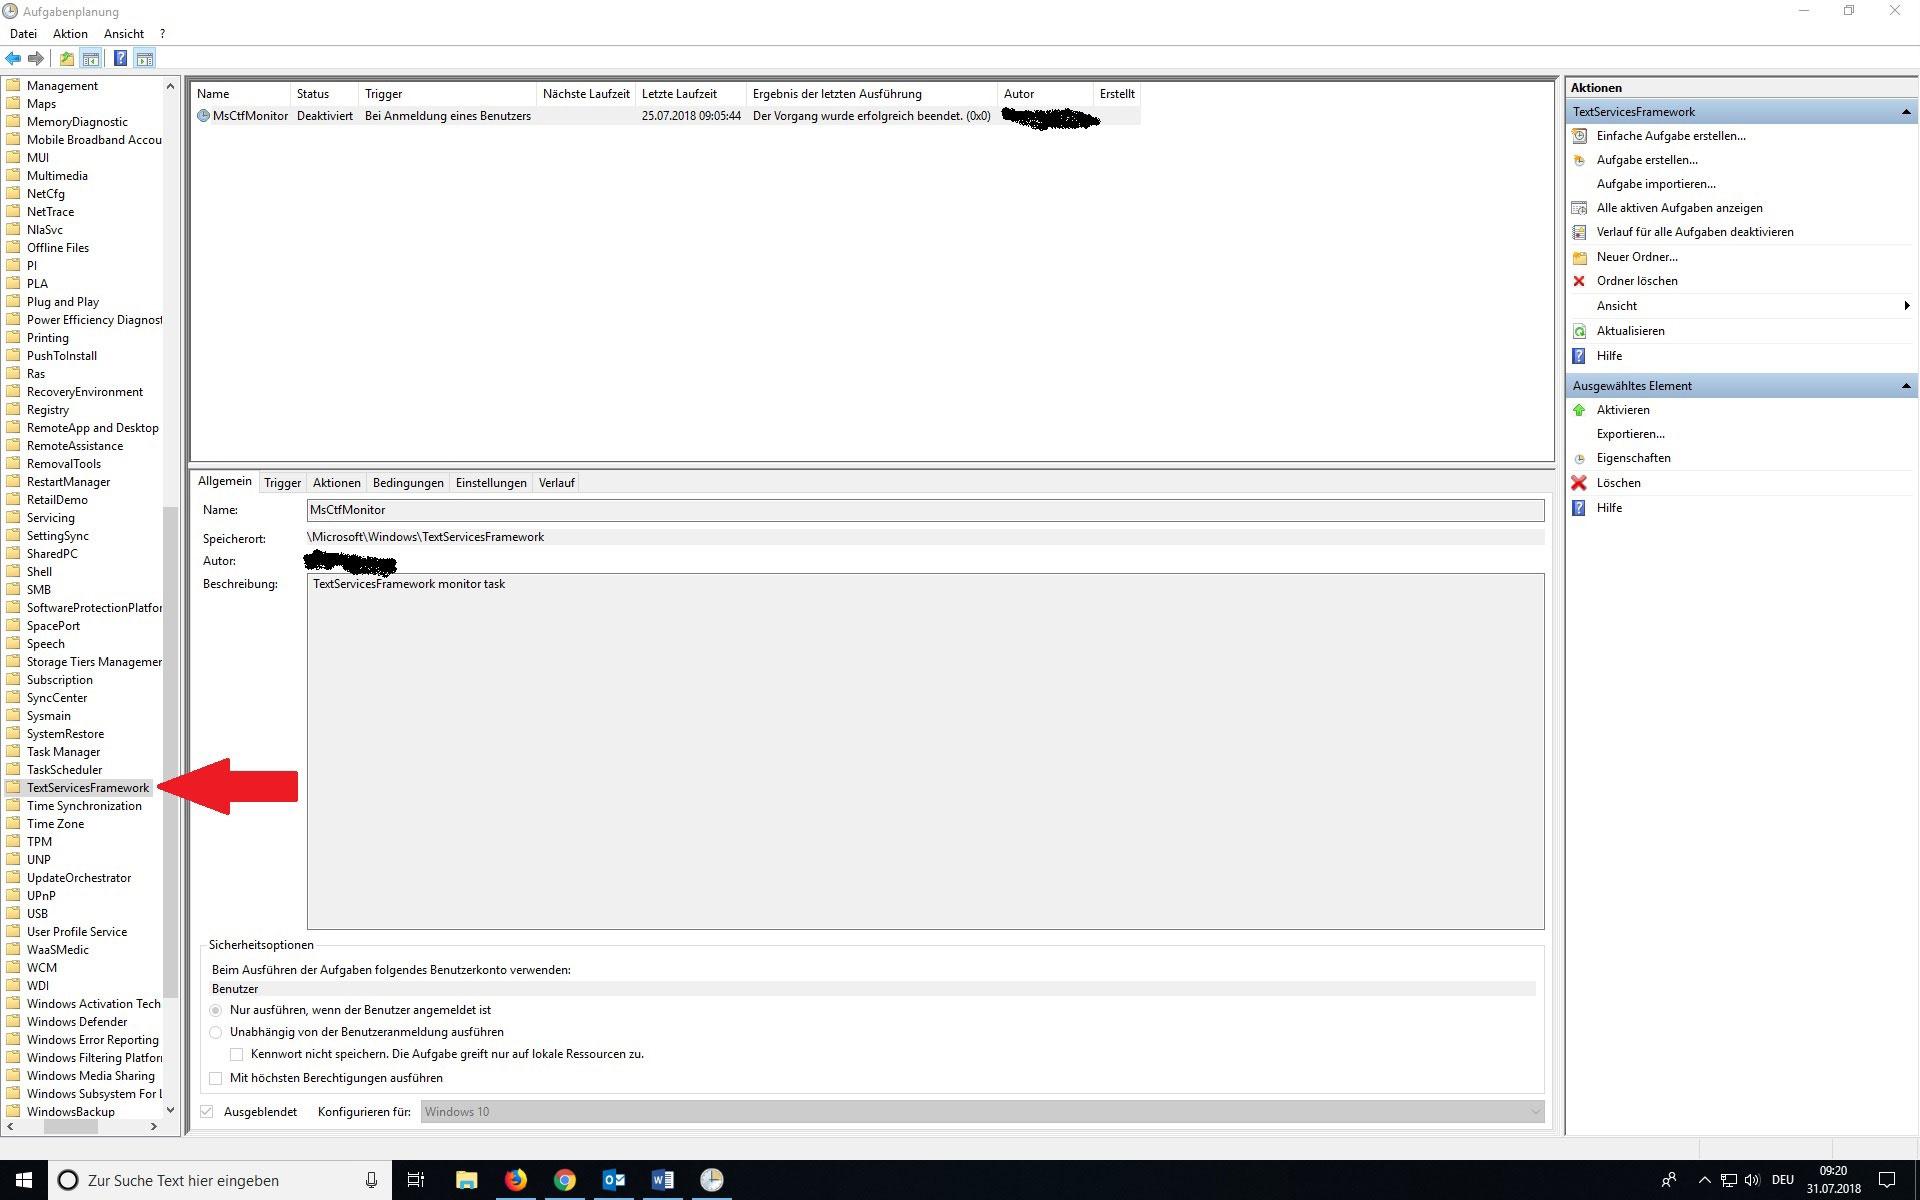 TextServicesFramework